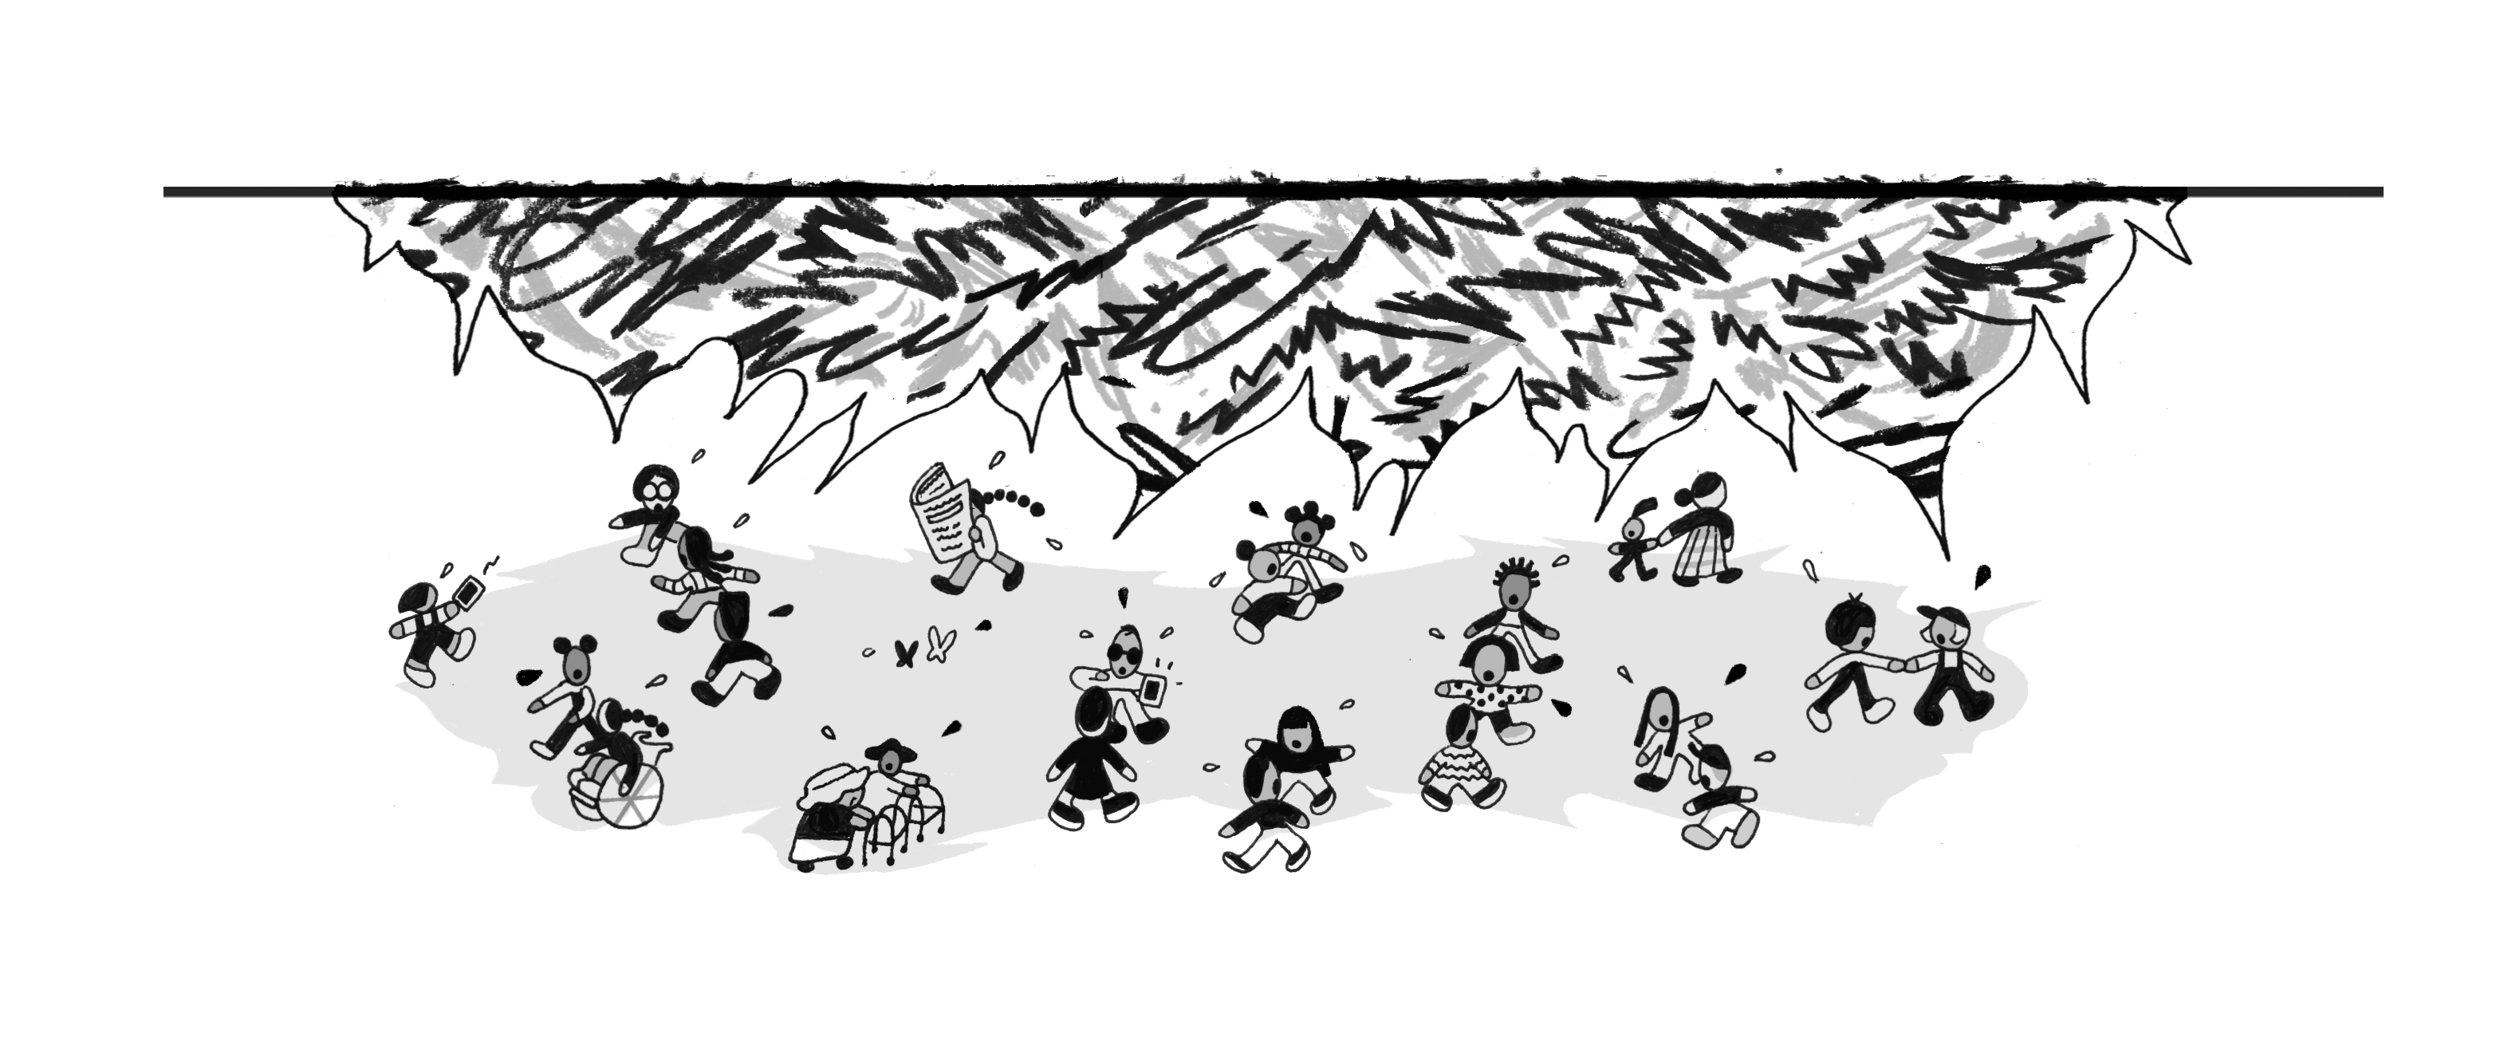 NYT Sketchbook, 2018 (AD: Andrew Sondern)